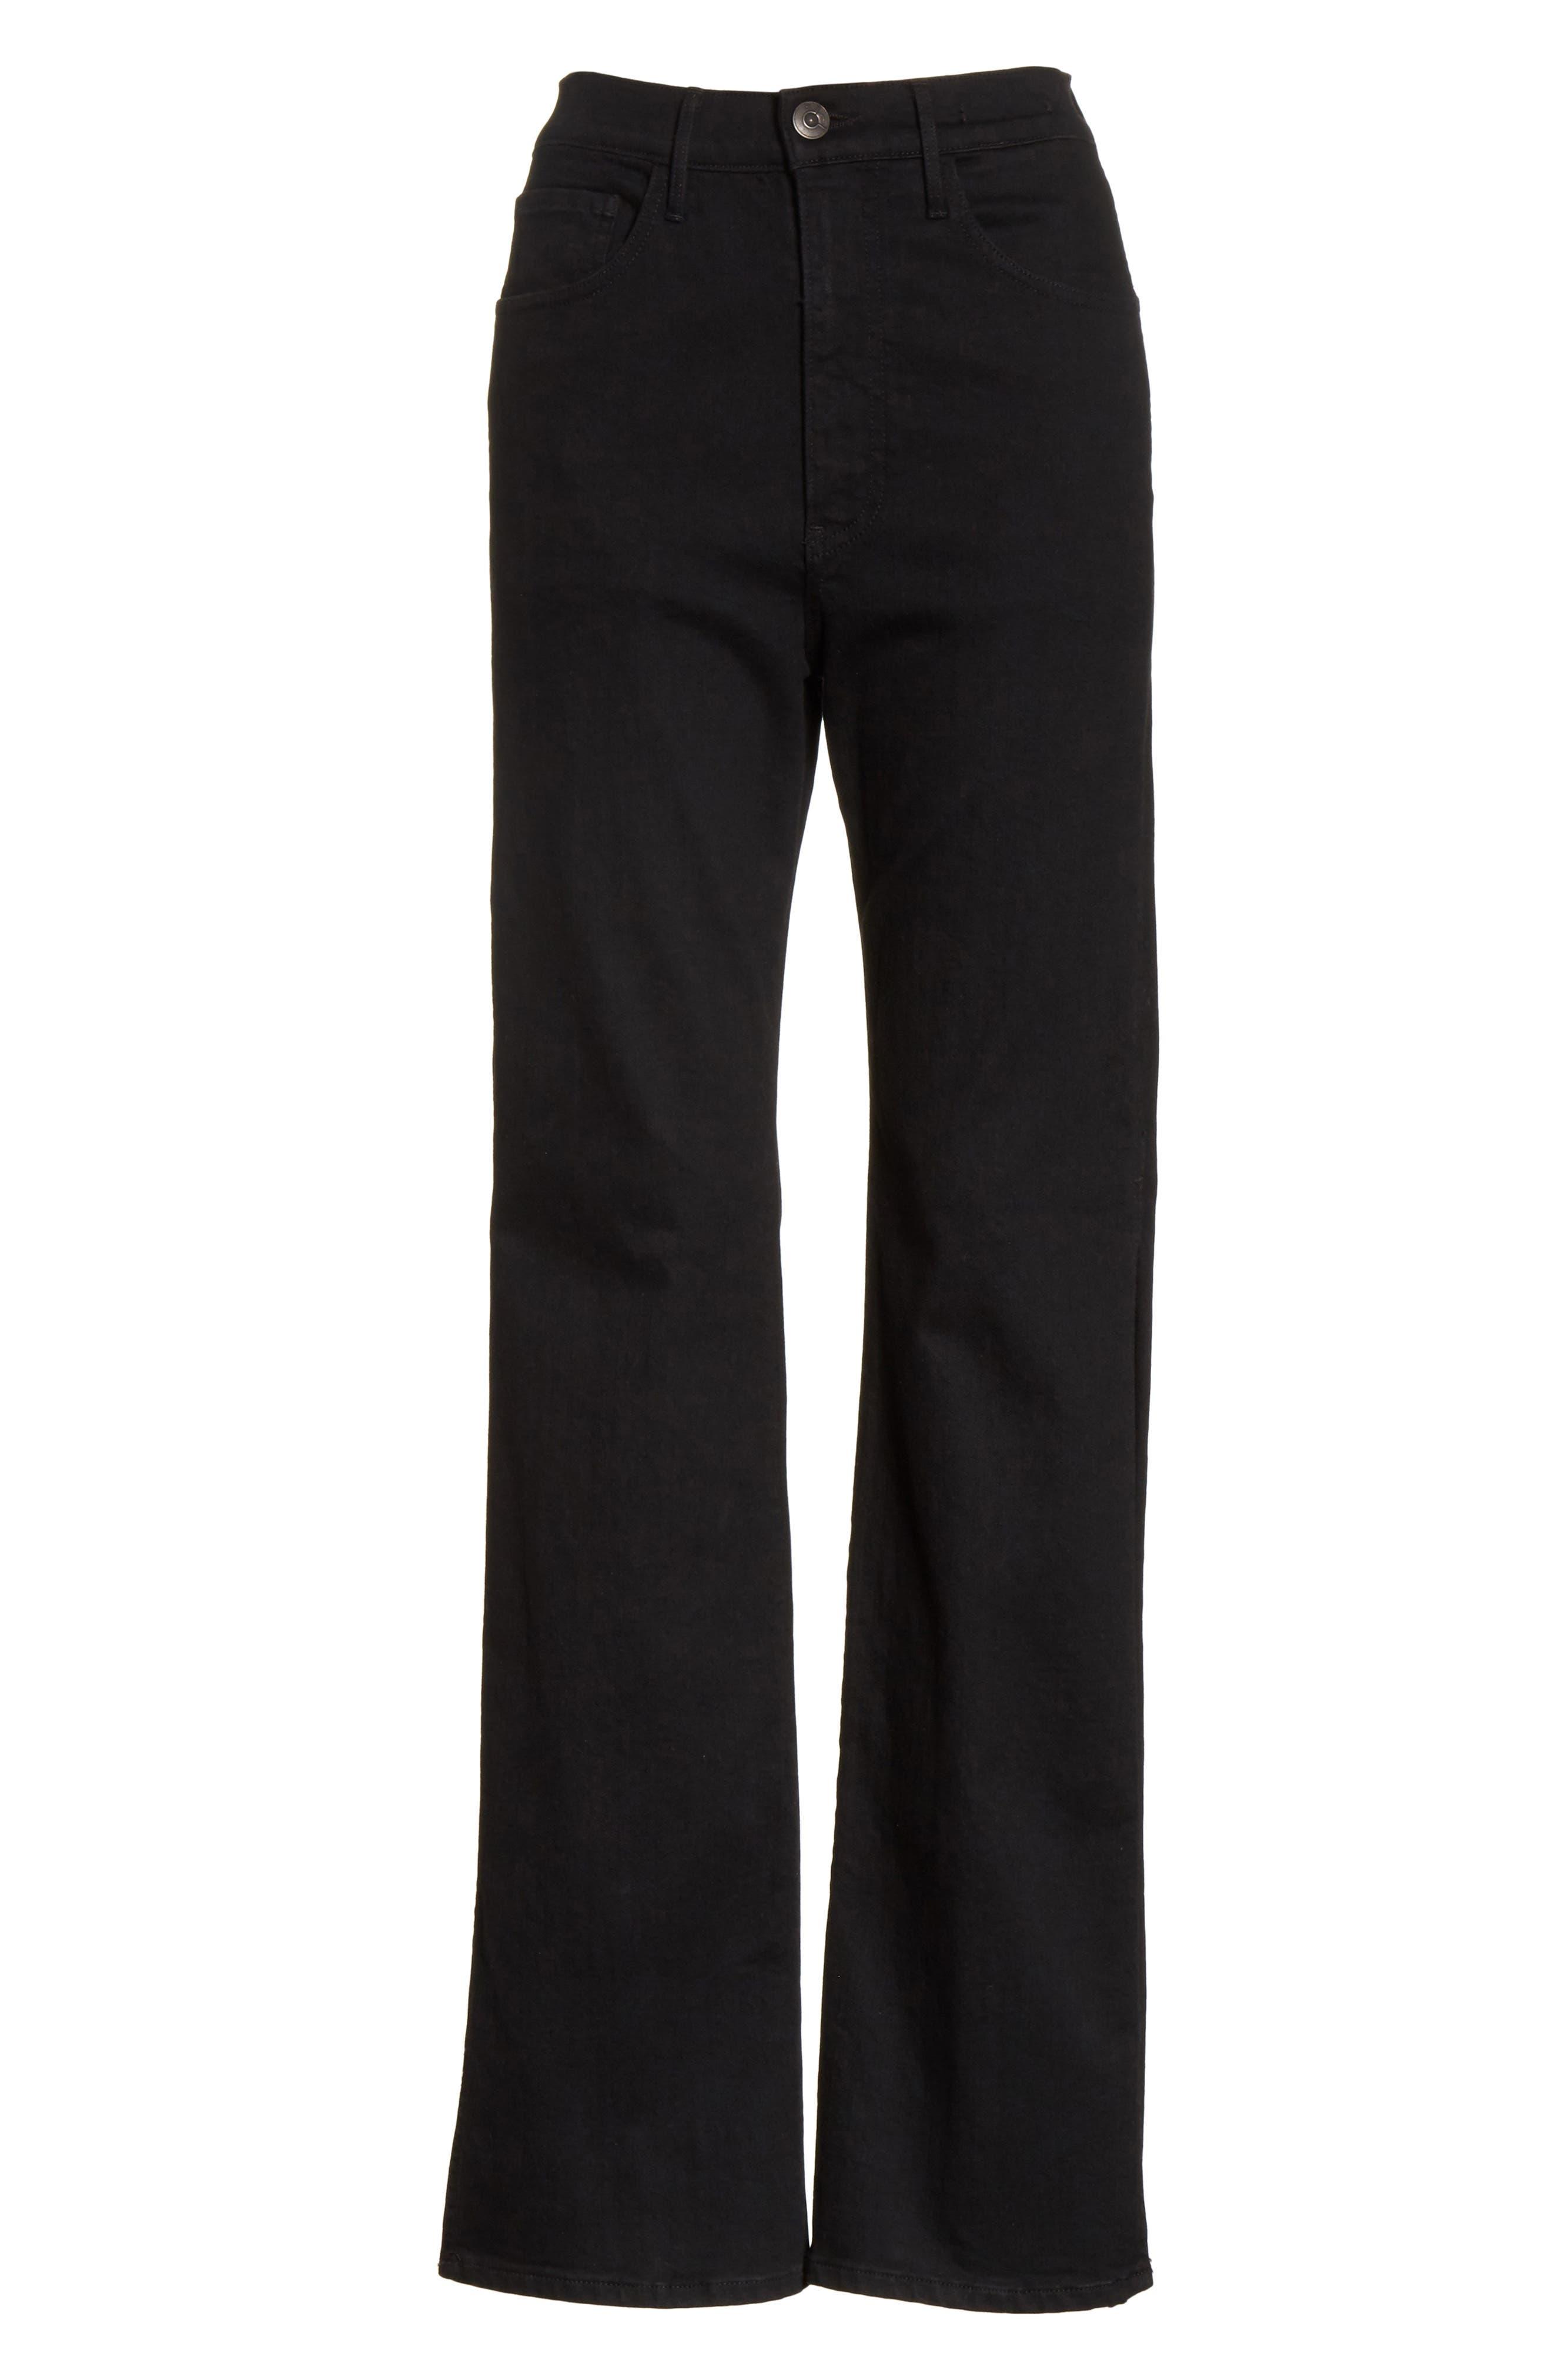 W4 Adeline High Waist Split Flare Jeans,                             Alternate thumbnail 6, color,                             Black No 1